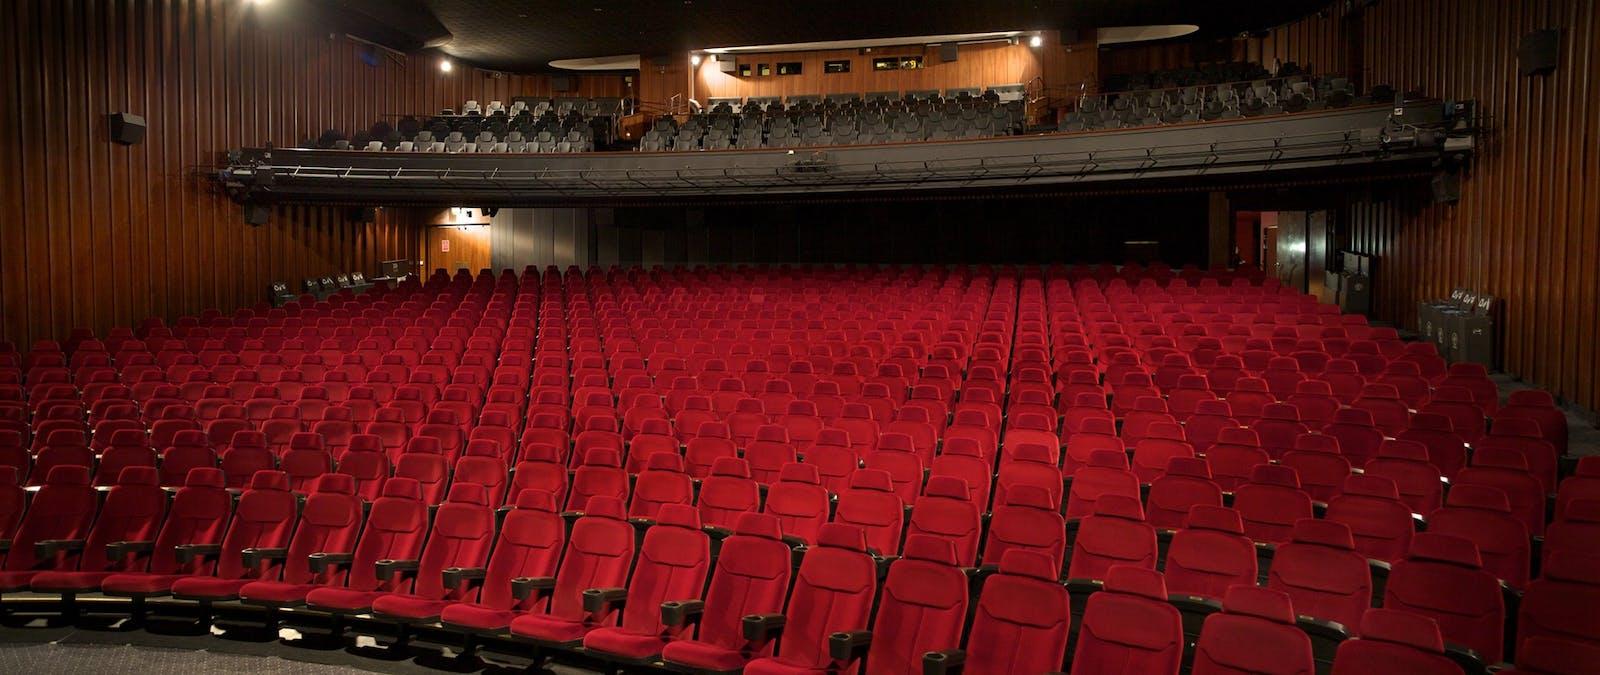 Kinesiska biografer öppnar på nytt